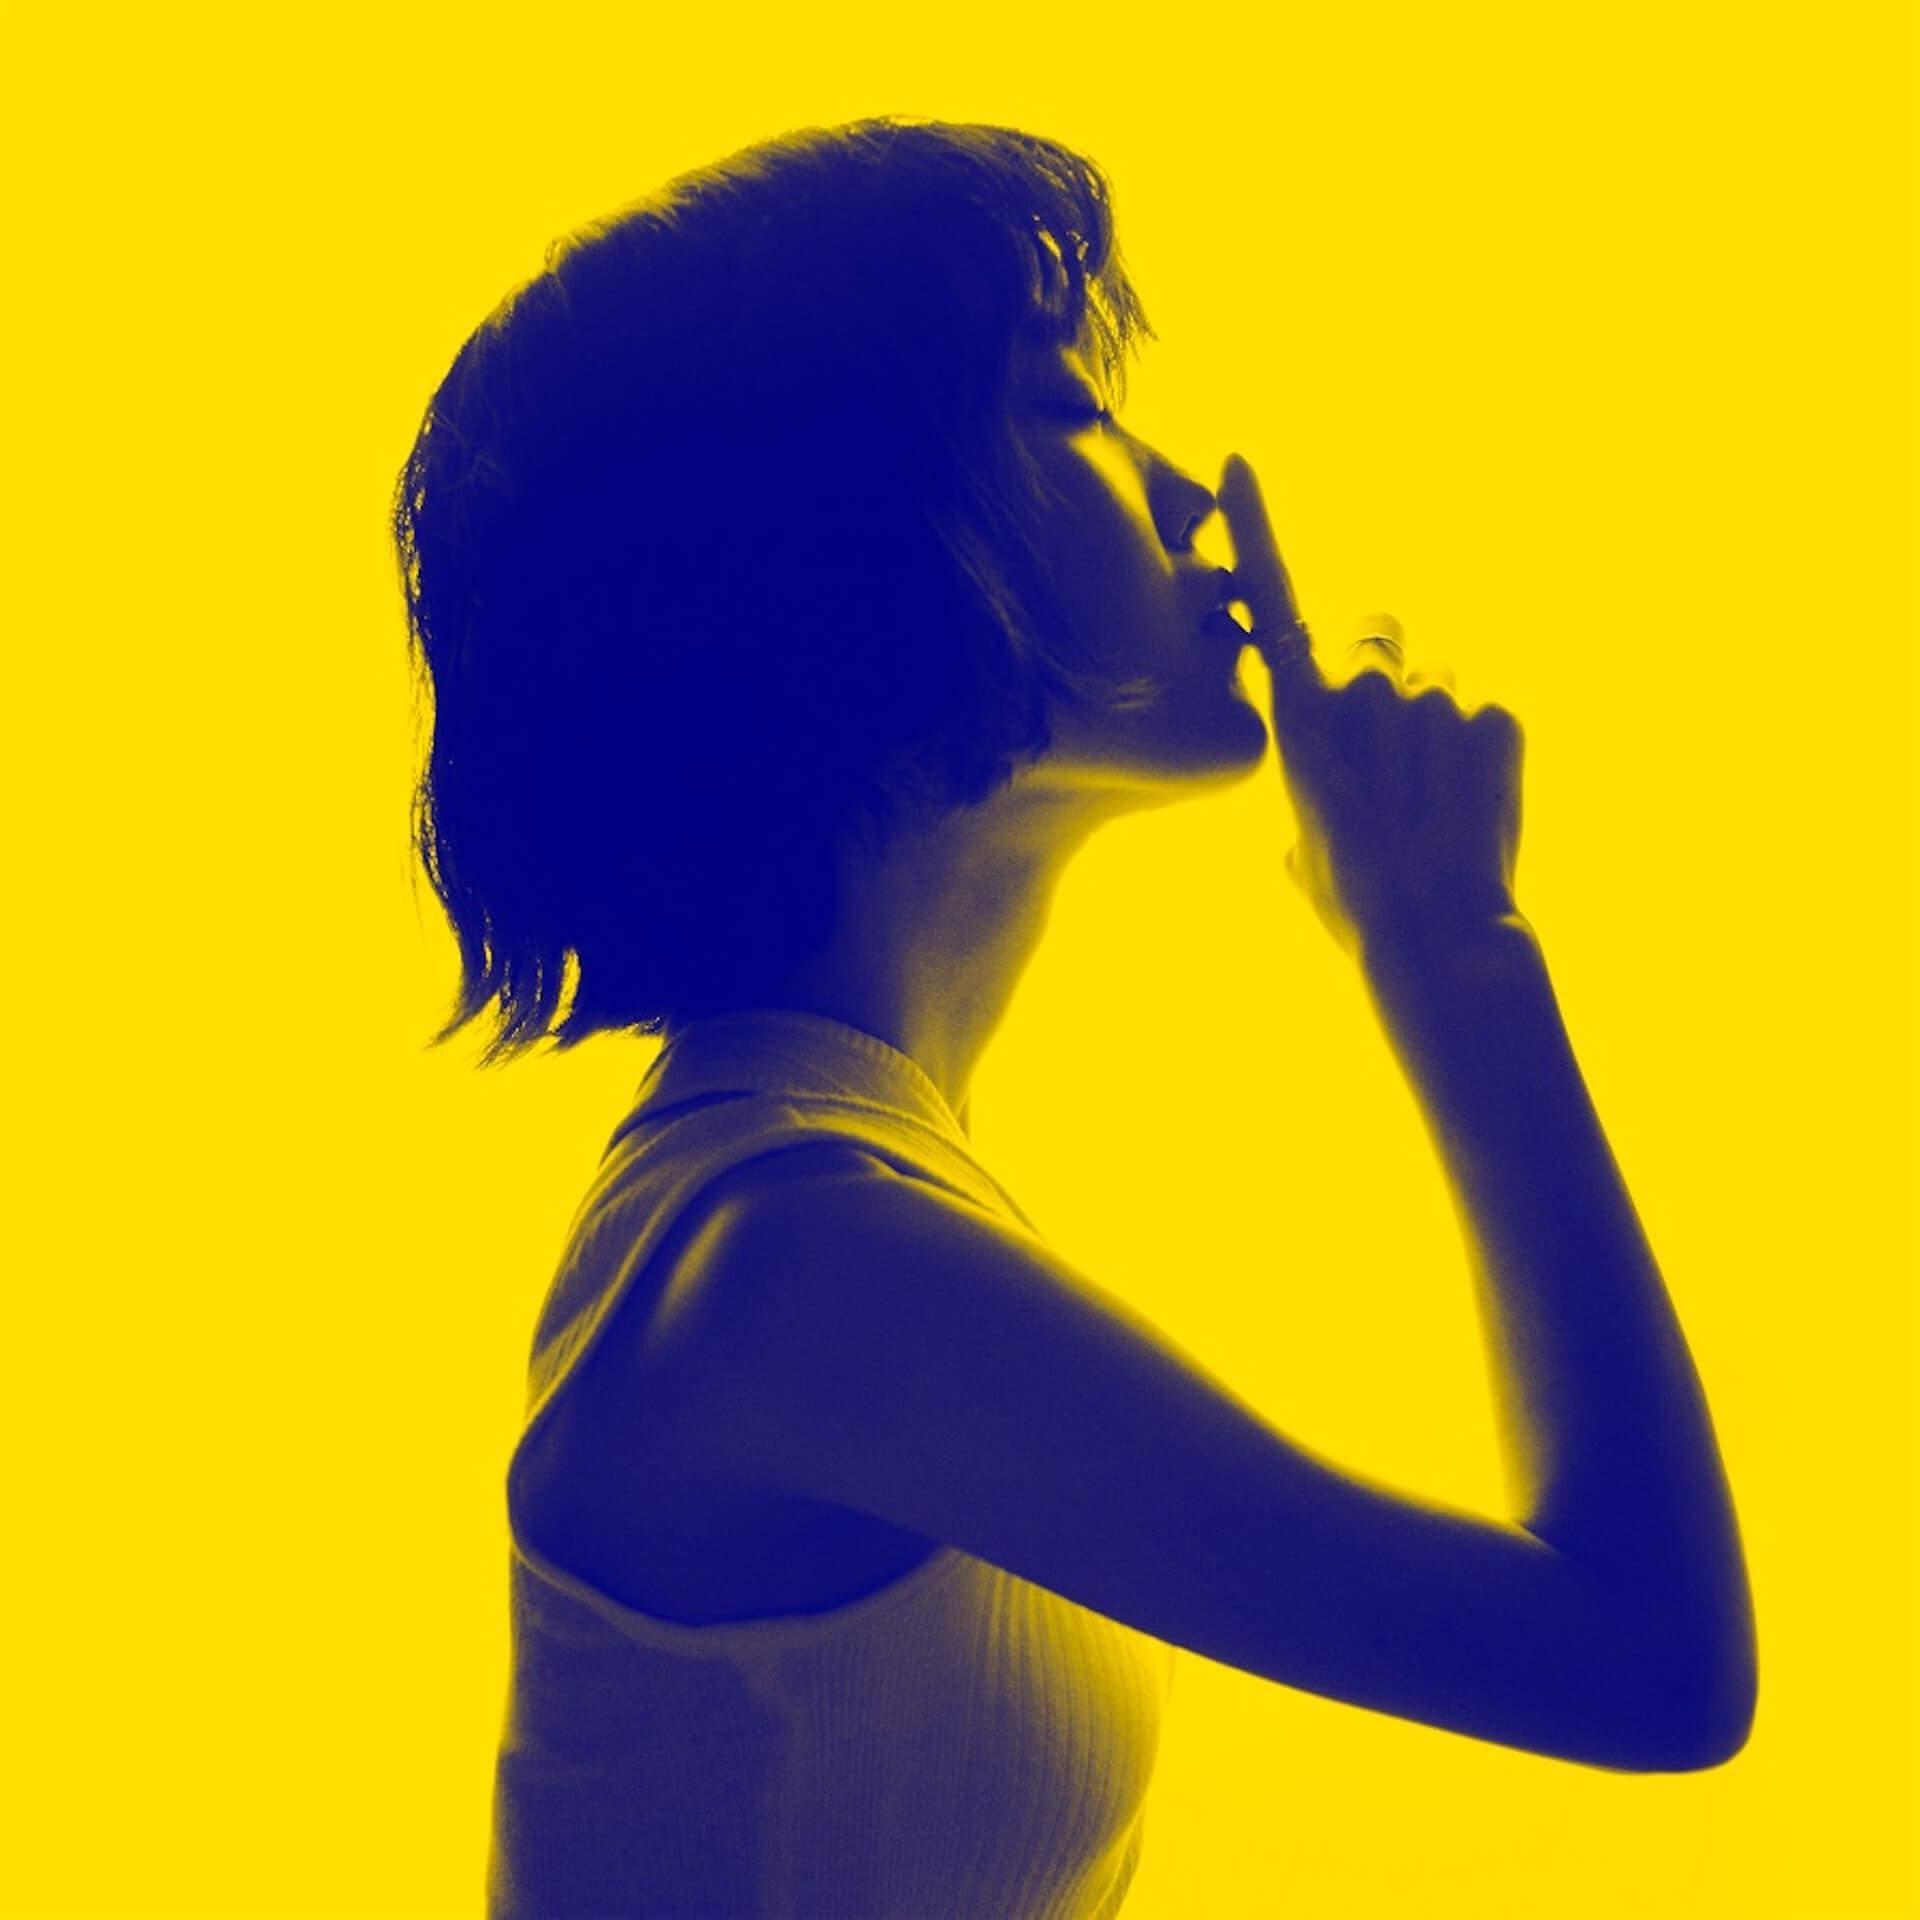 "Reiの2ndアルバム『HONEY』が本日リリース!アルバム発売を記念し東名阪ツアー""SOUNDS of HONEY""の開催も決定 music201125_rei_honey_tour_1"